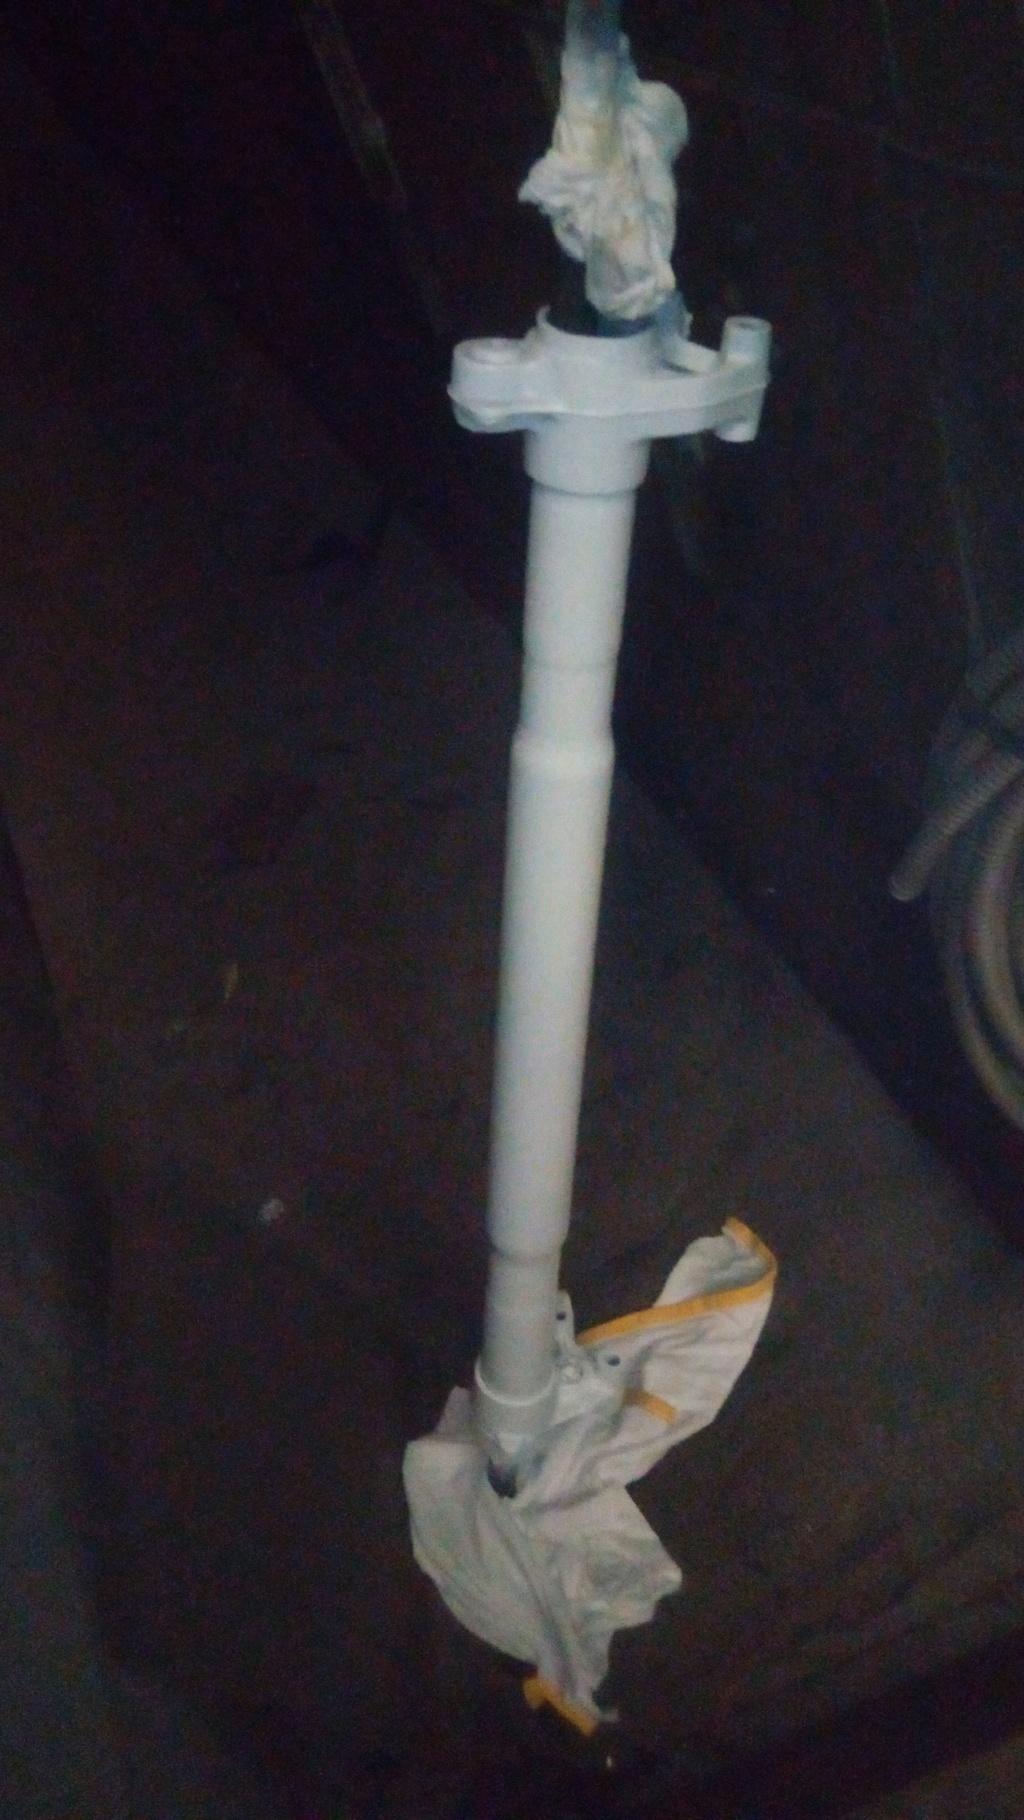 [58] 205 GTi Griffe - 130cv - AM91 - Vert Fluorite Img_2054